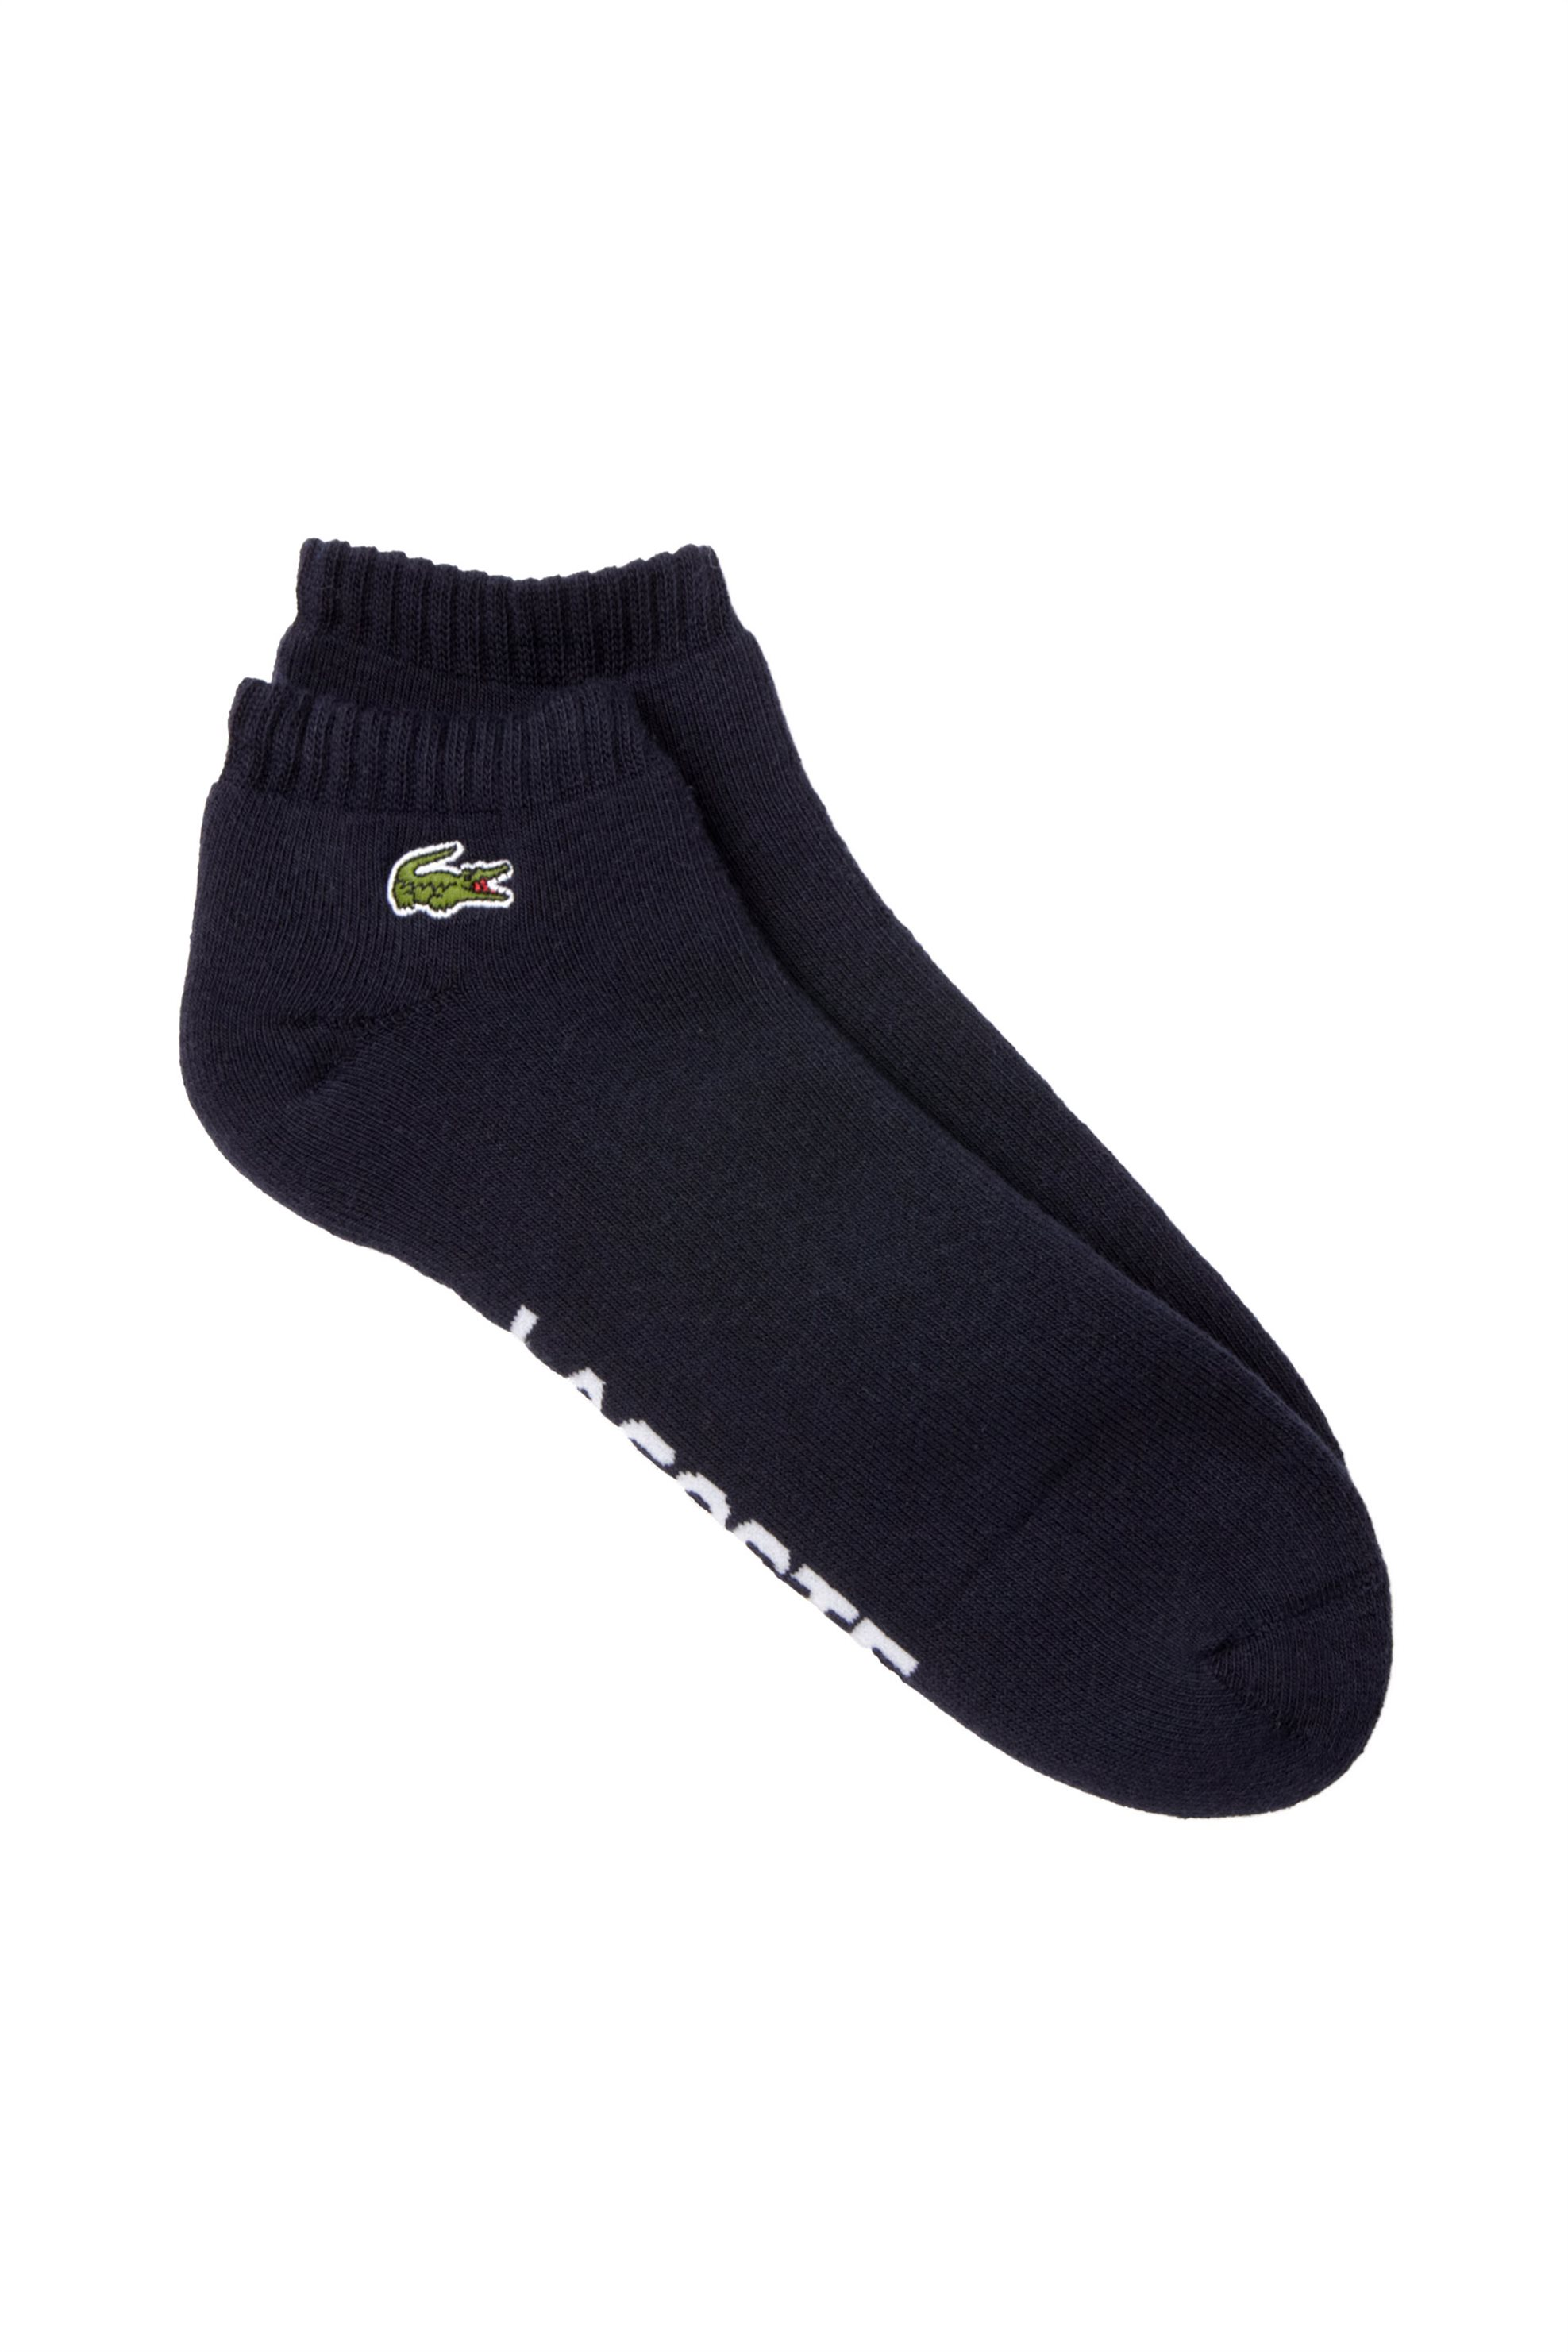 Lacoste ανδρικές χαμηλές κάλτσες The Spring / Summer 2018 Tennis Collection - RA ανδρασ   ρουχα   εσώρουχα   πυτζάμες   εσώρουχα   κάλτσες   κάλτσες   κοντές κάλ